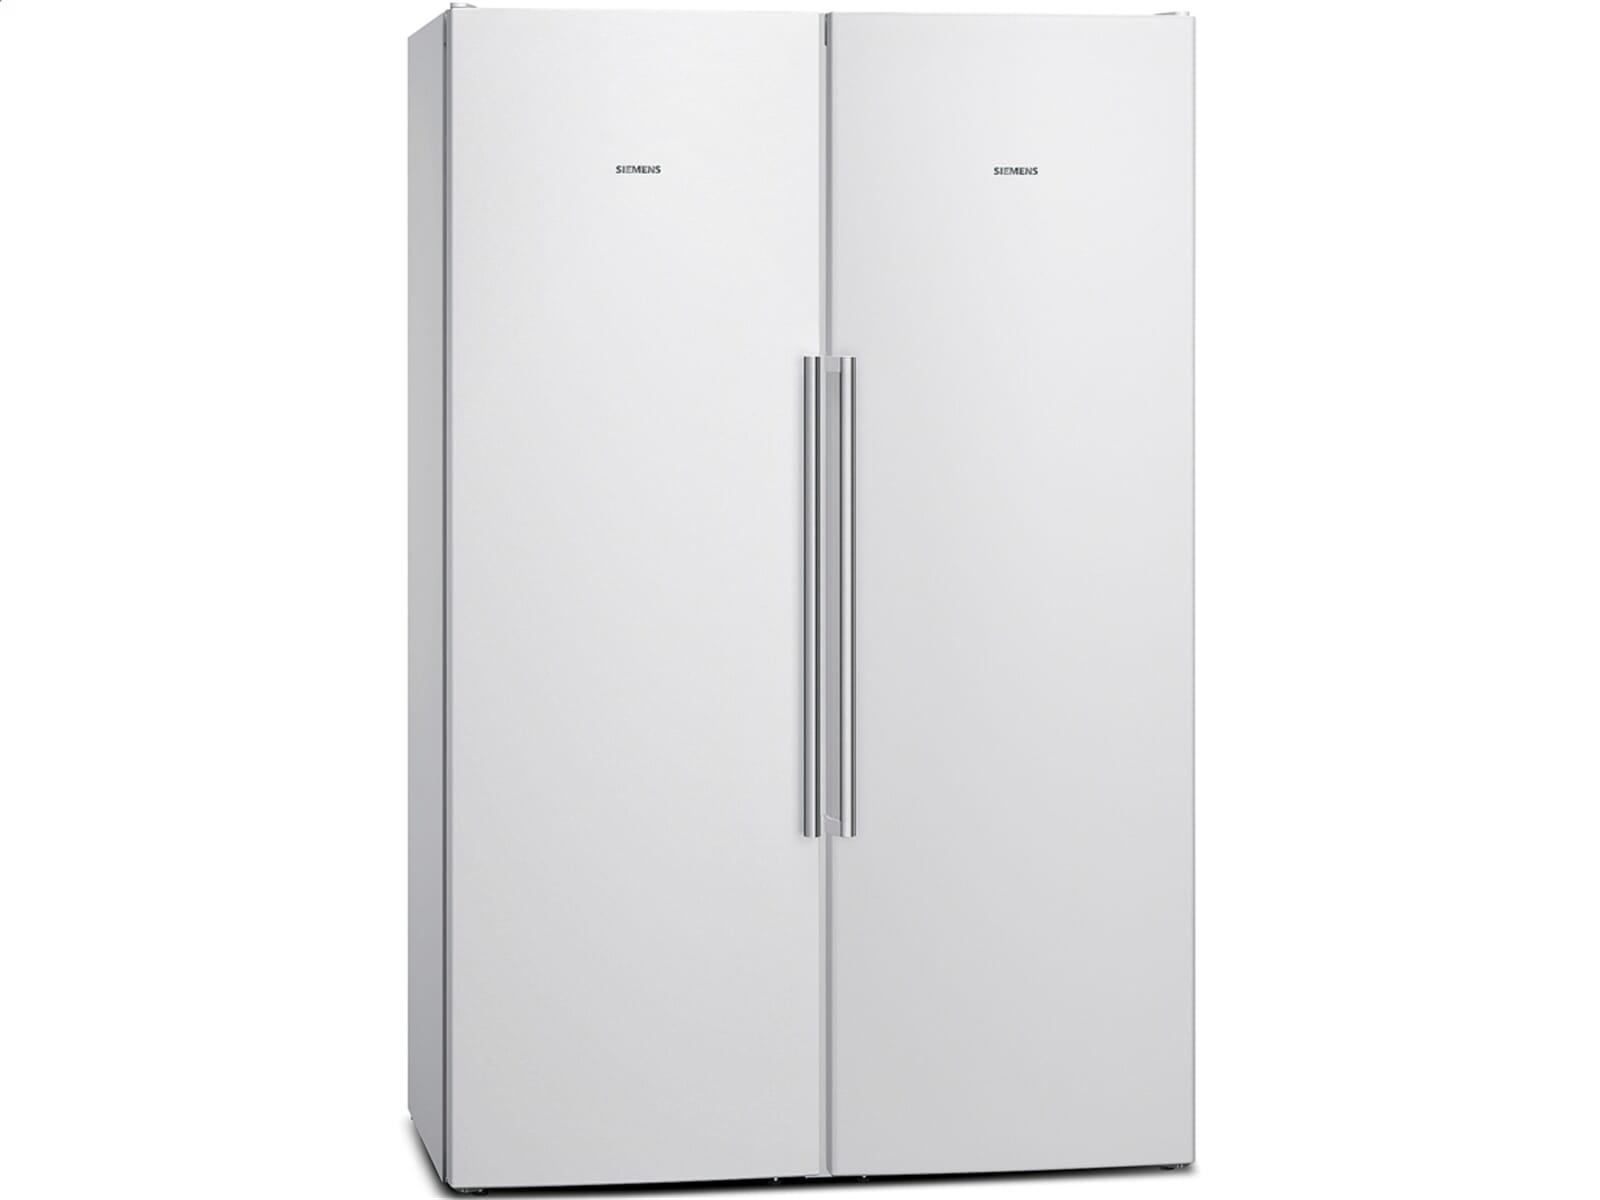 Side By Side Kühlschrank Real : Einbaukühlschrank edelstahl exquisit kühlschrank ks a